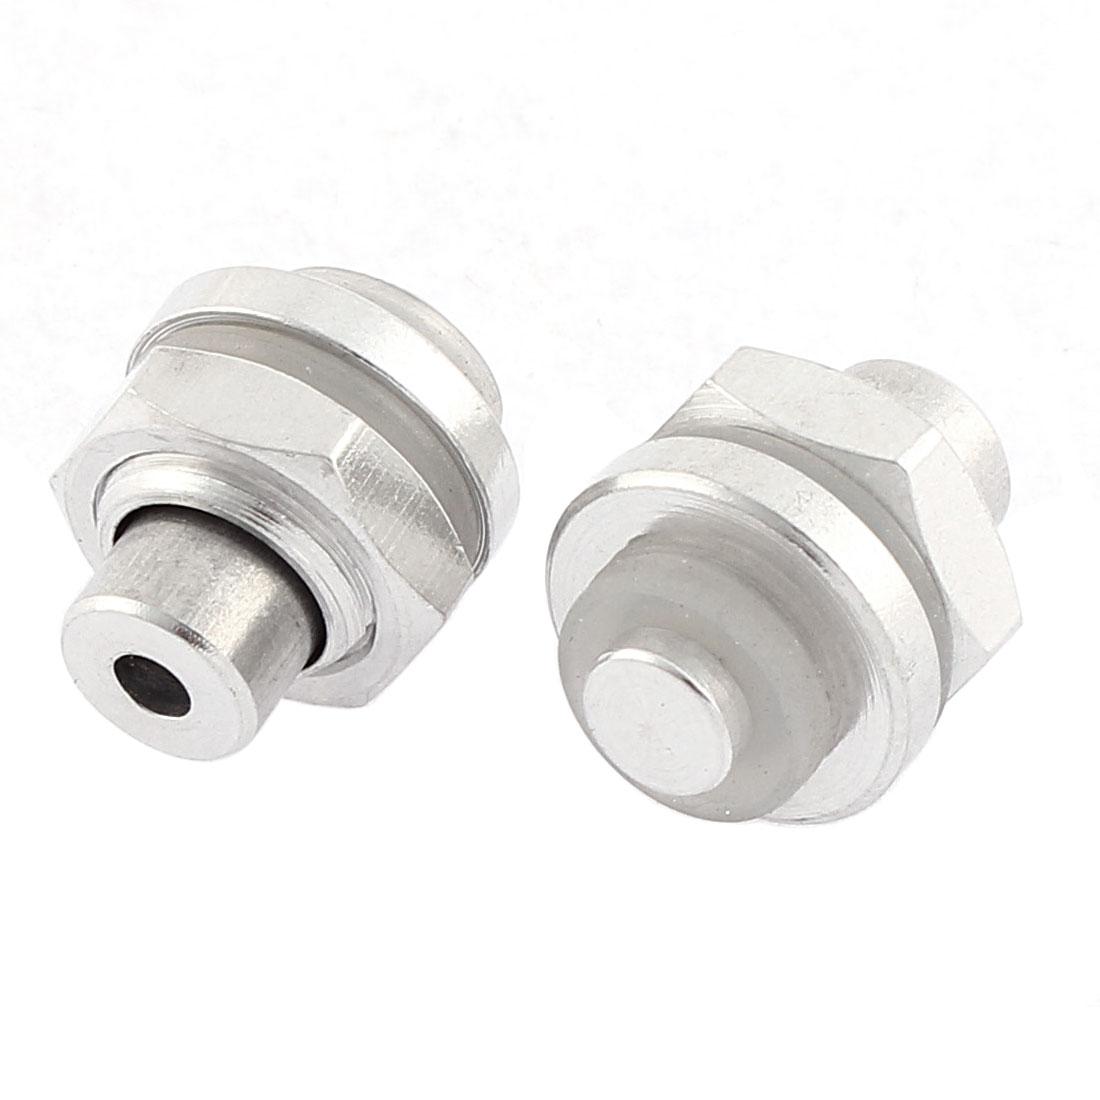 Pressure Cooker Aluminium Safety Valve 2cm Length Silver Tone 2 Pcs